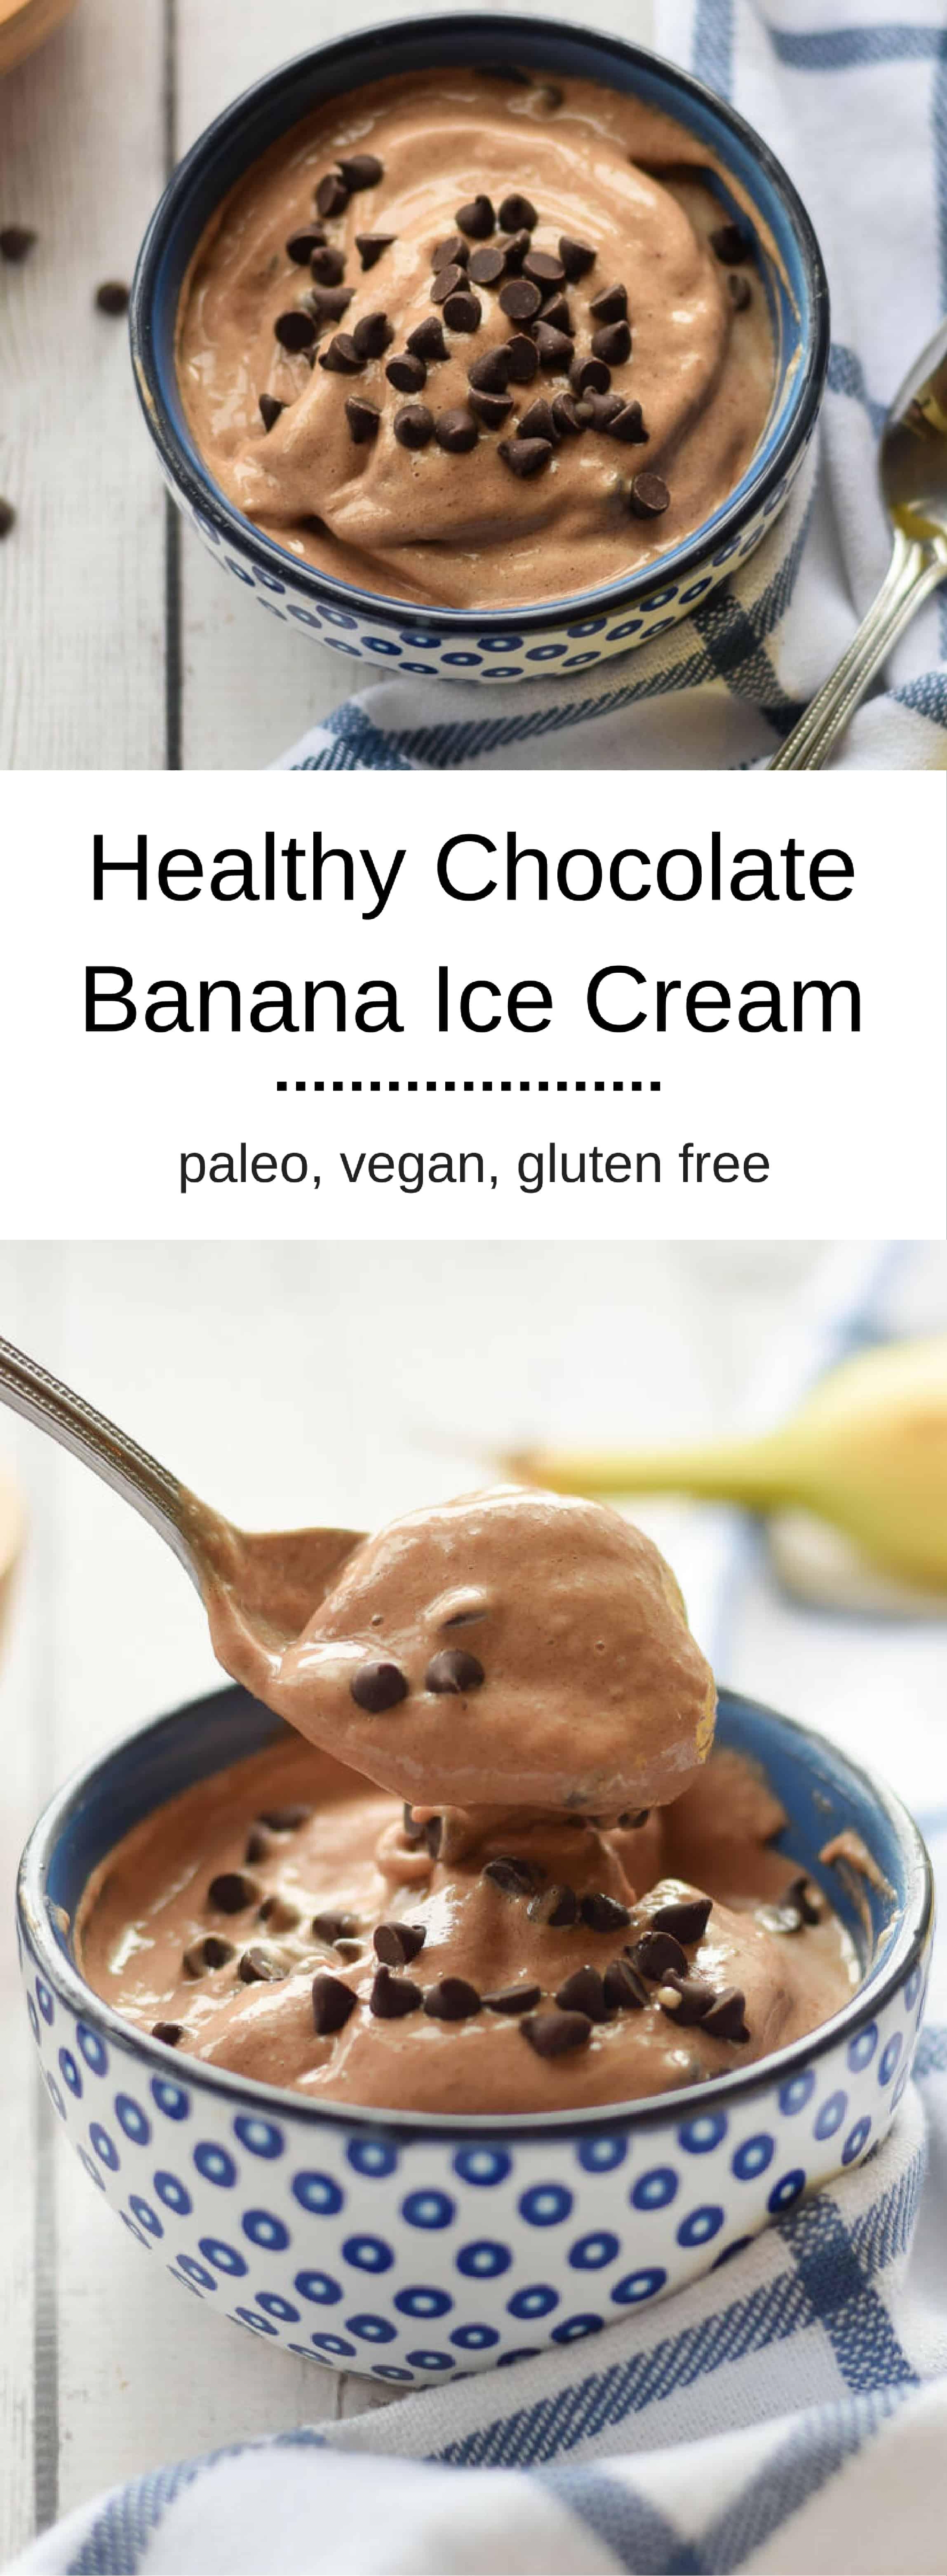 Healthy Chocolate Banana Ice Cream